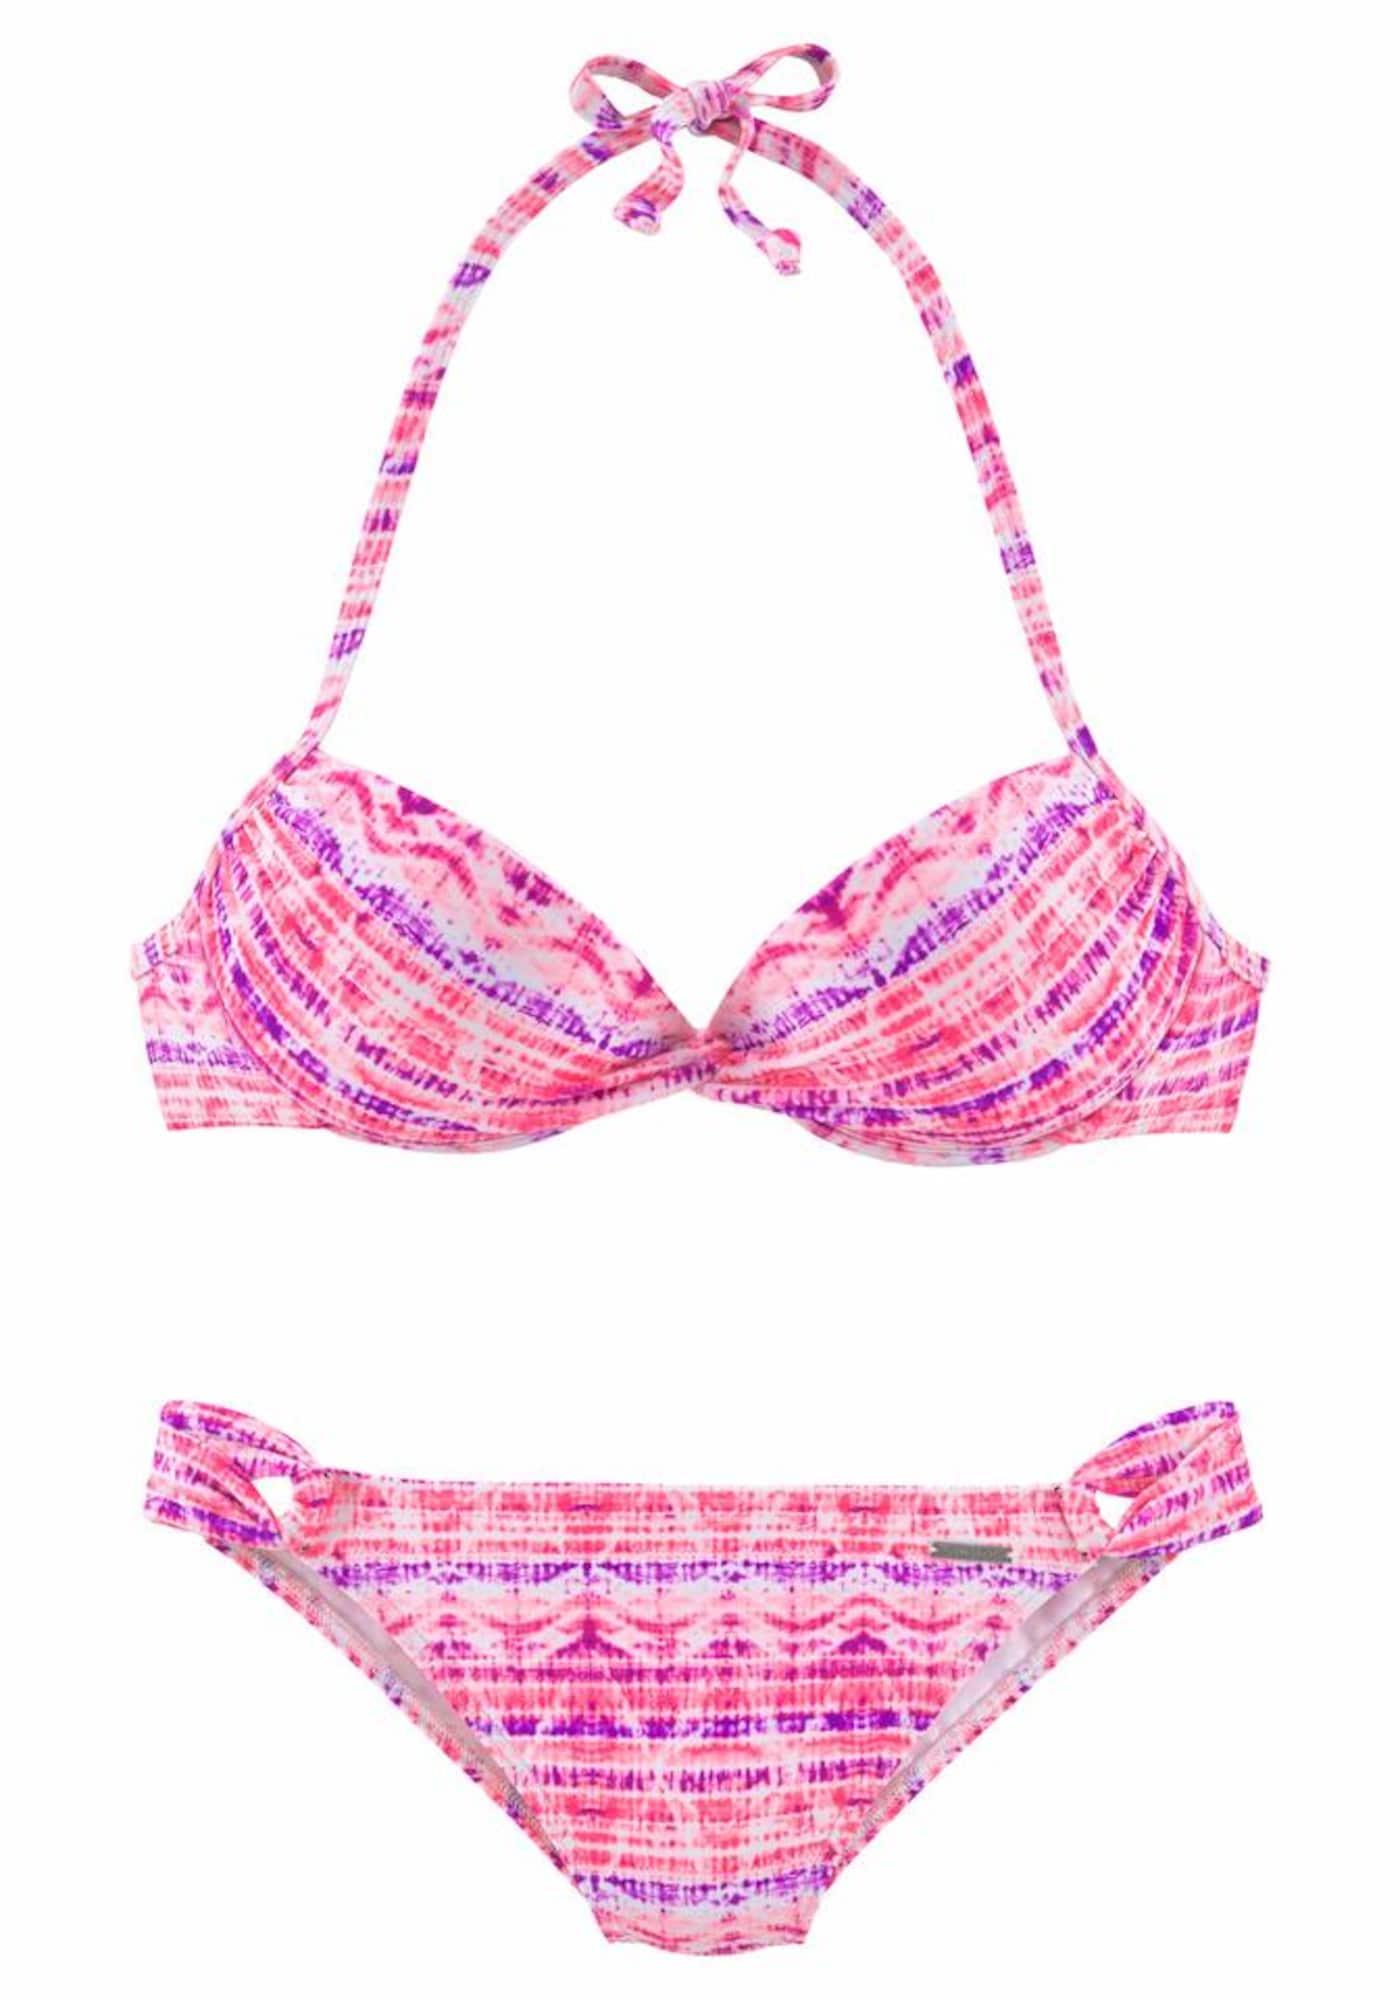 CHIEMSEE, Dames Bikini, pink